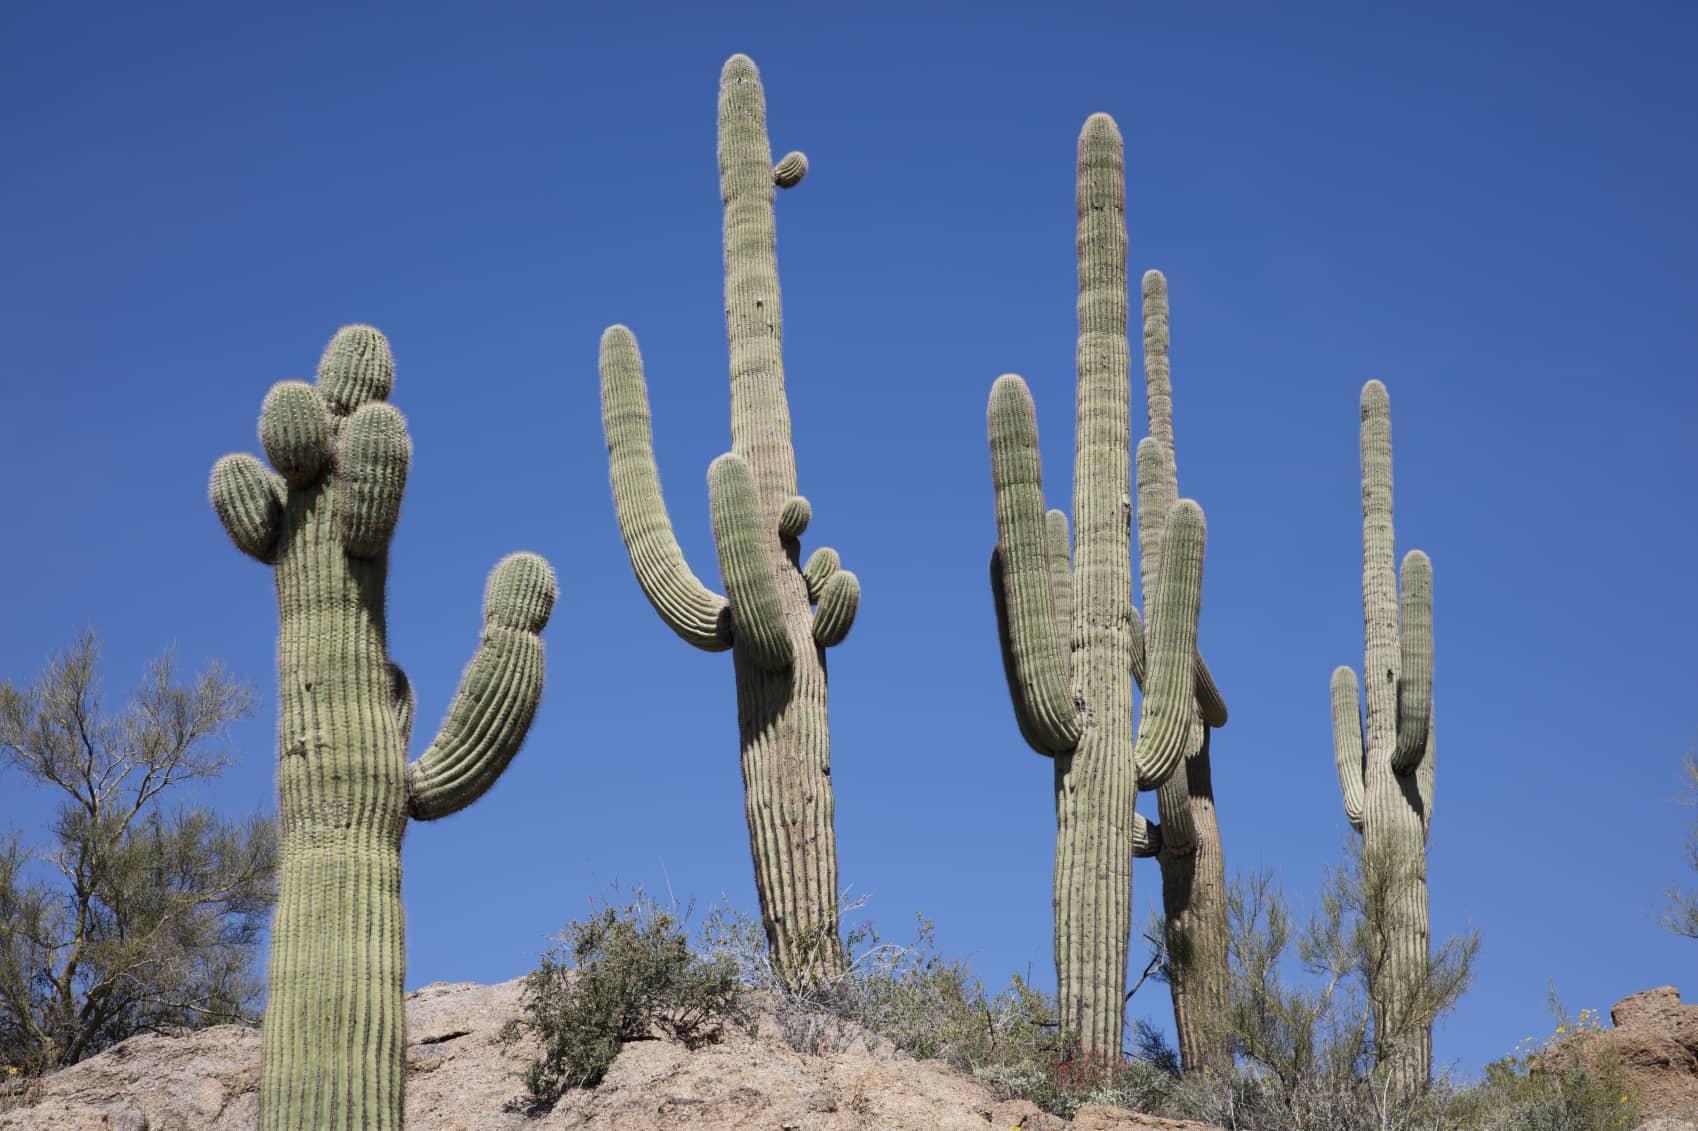 iStock_000088969015_Medium SolarWorld To Supply 17.5 MW Nevada Desert Project